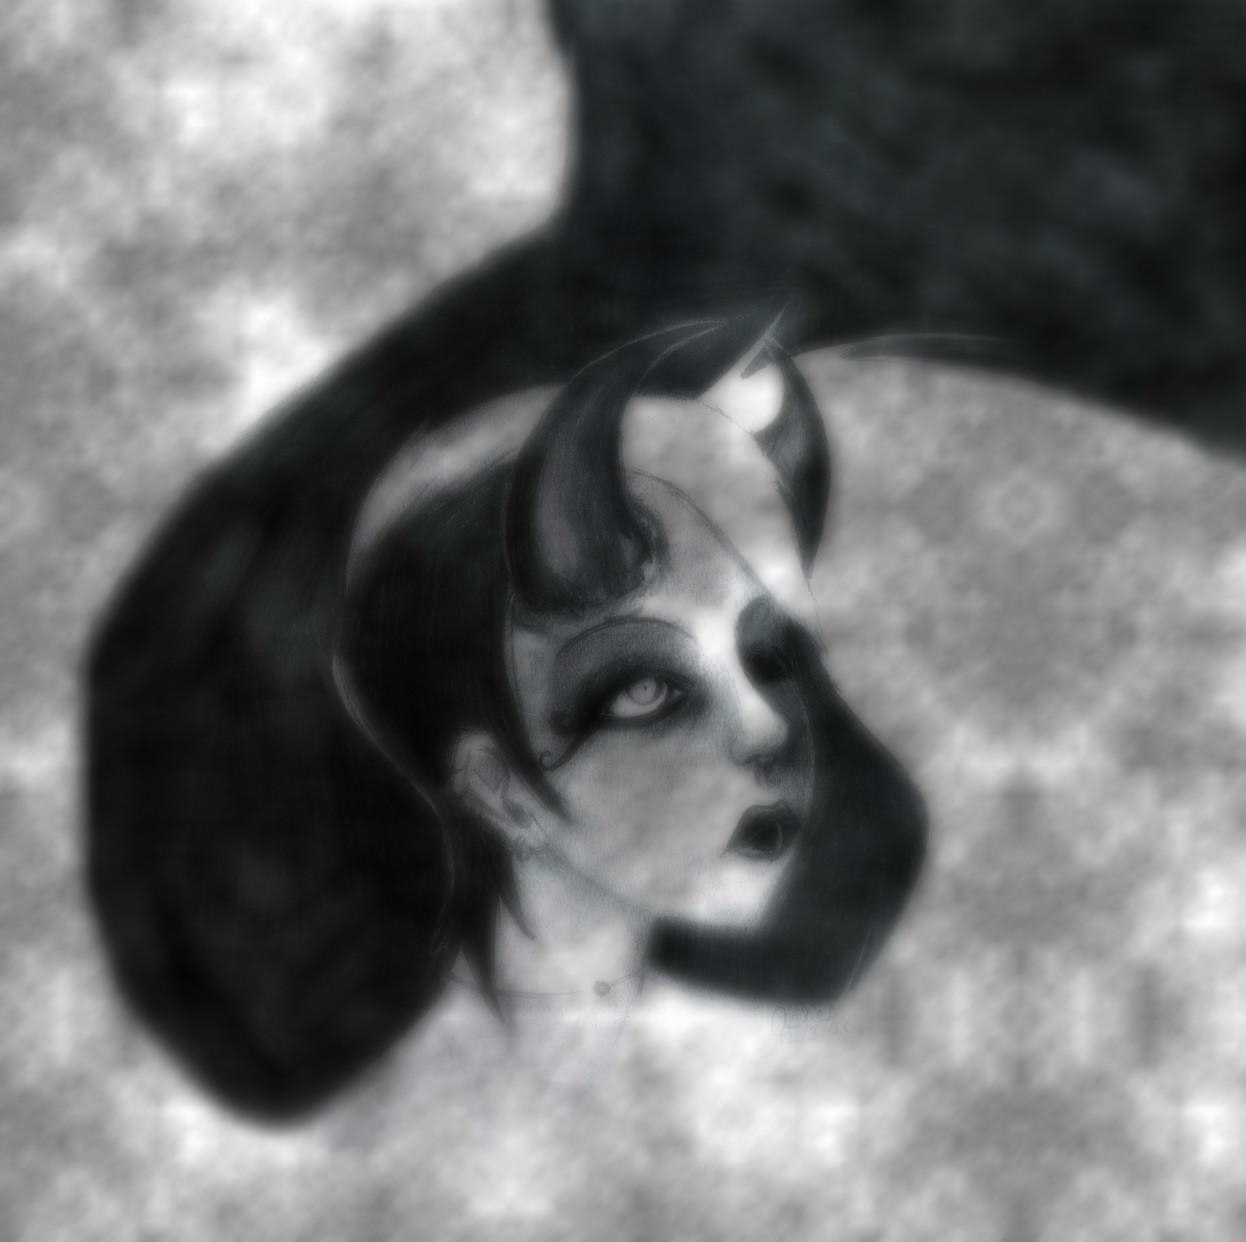 Darkness falls by dms_cheeseshirted_chorusneko